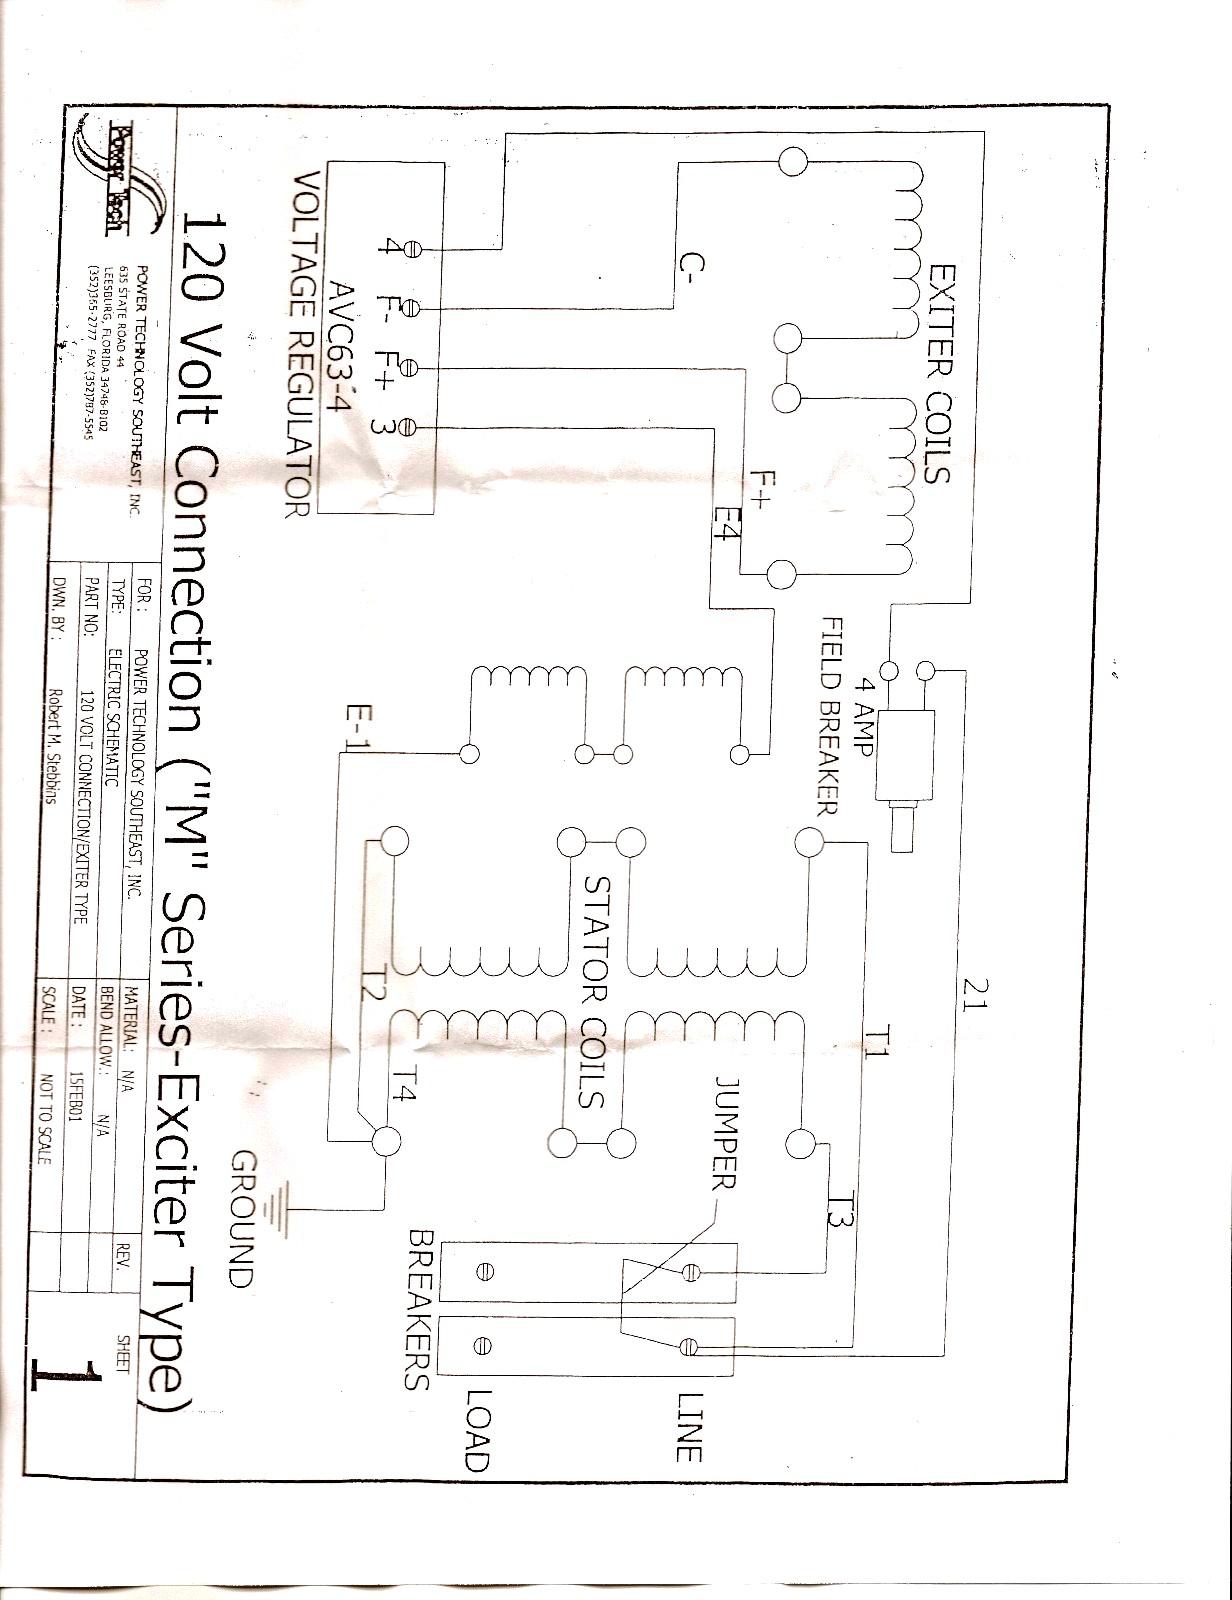 Kubota voltage regulator wiring diagram dolgular kubota voltage regulator wiring diagram dolgular asfbconference2016 Images